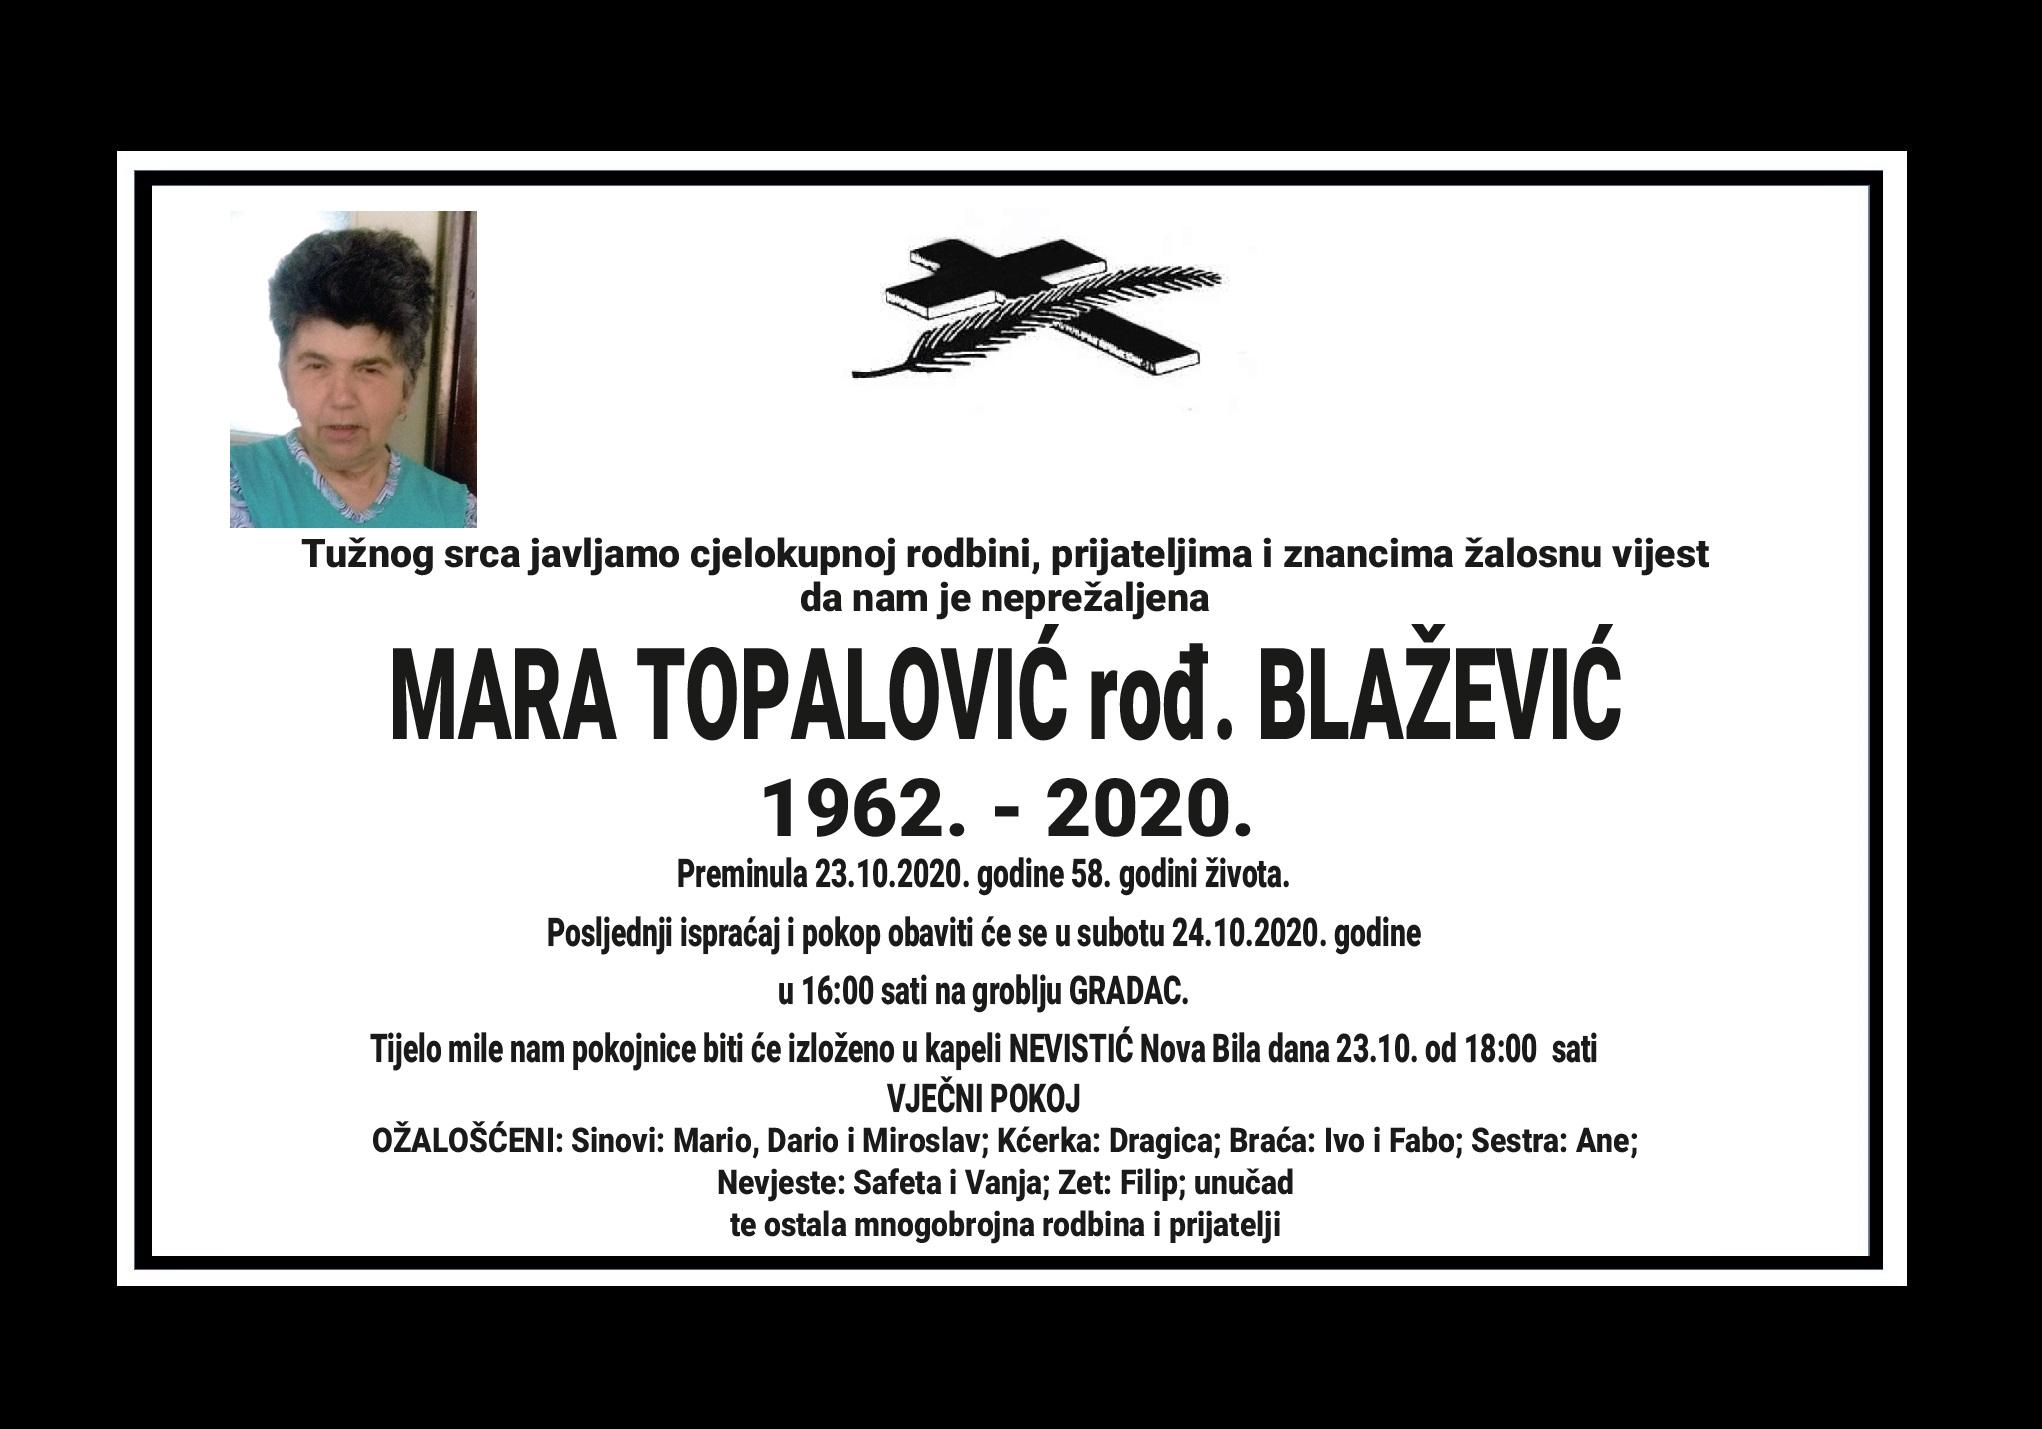 Mara Topalović rođ. Blažević